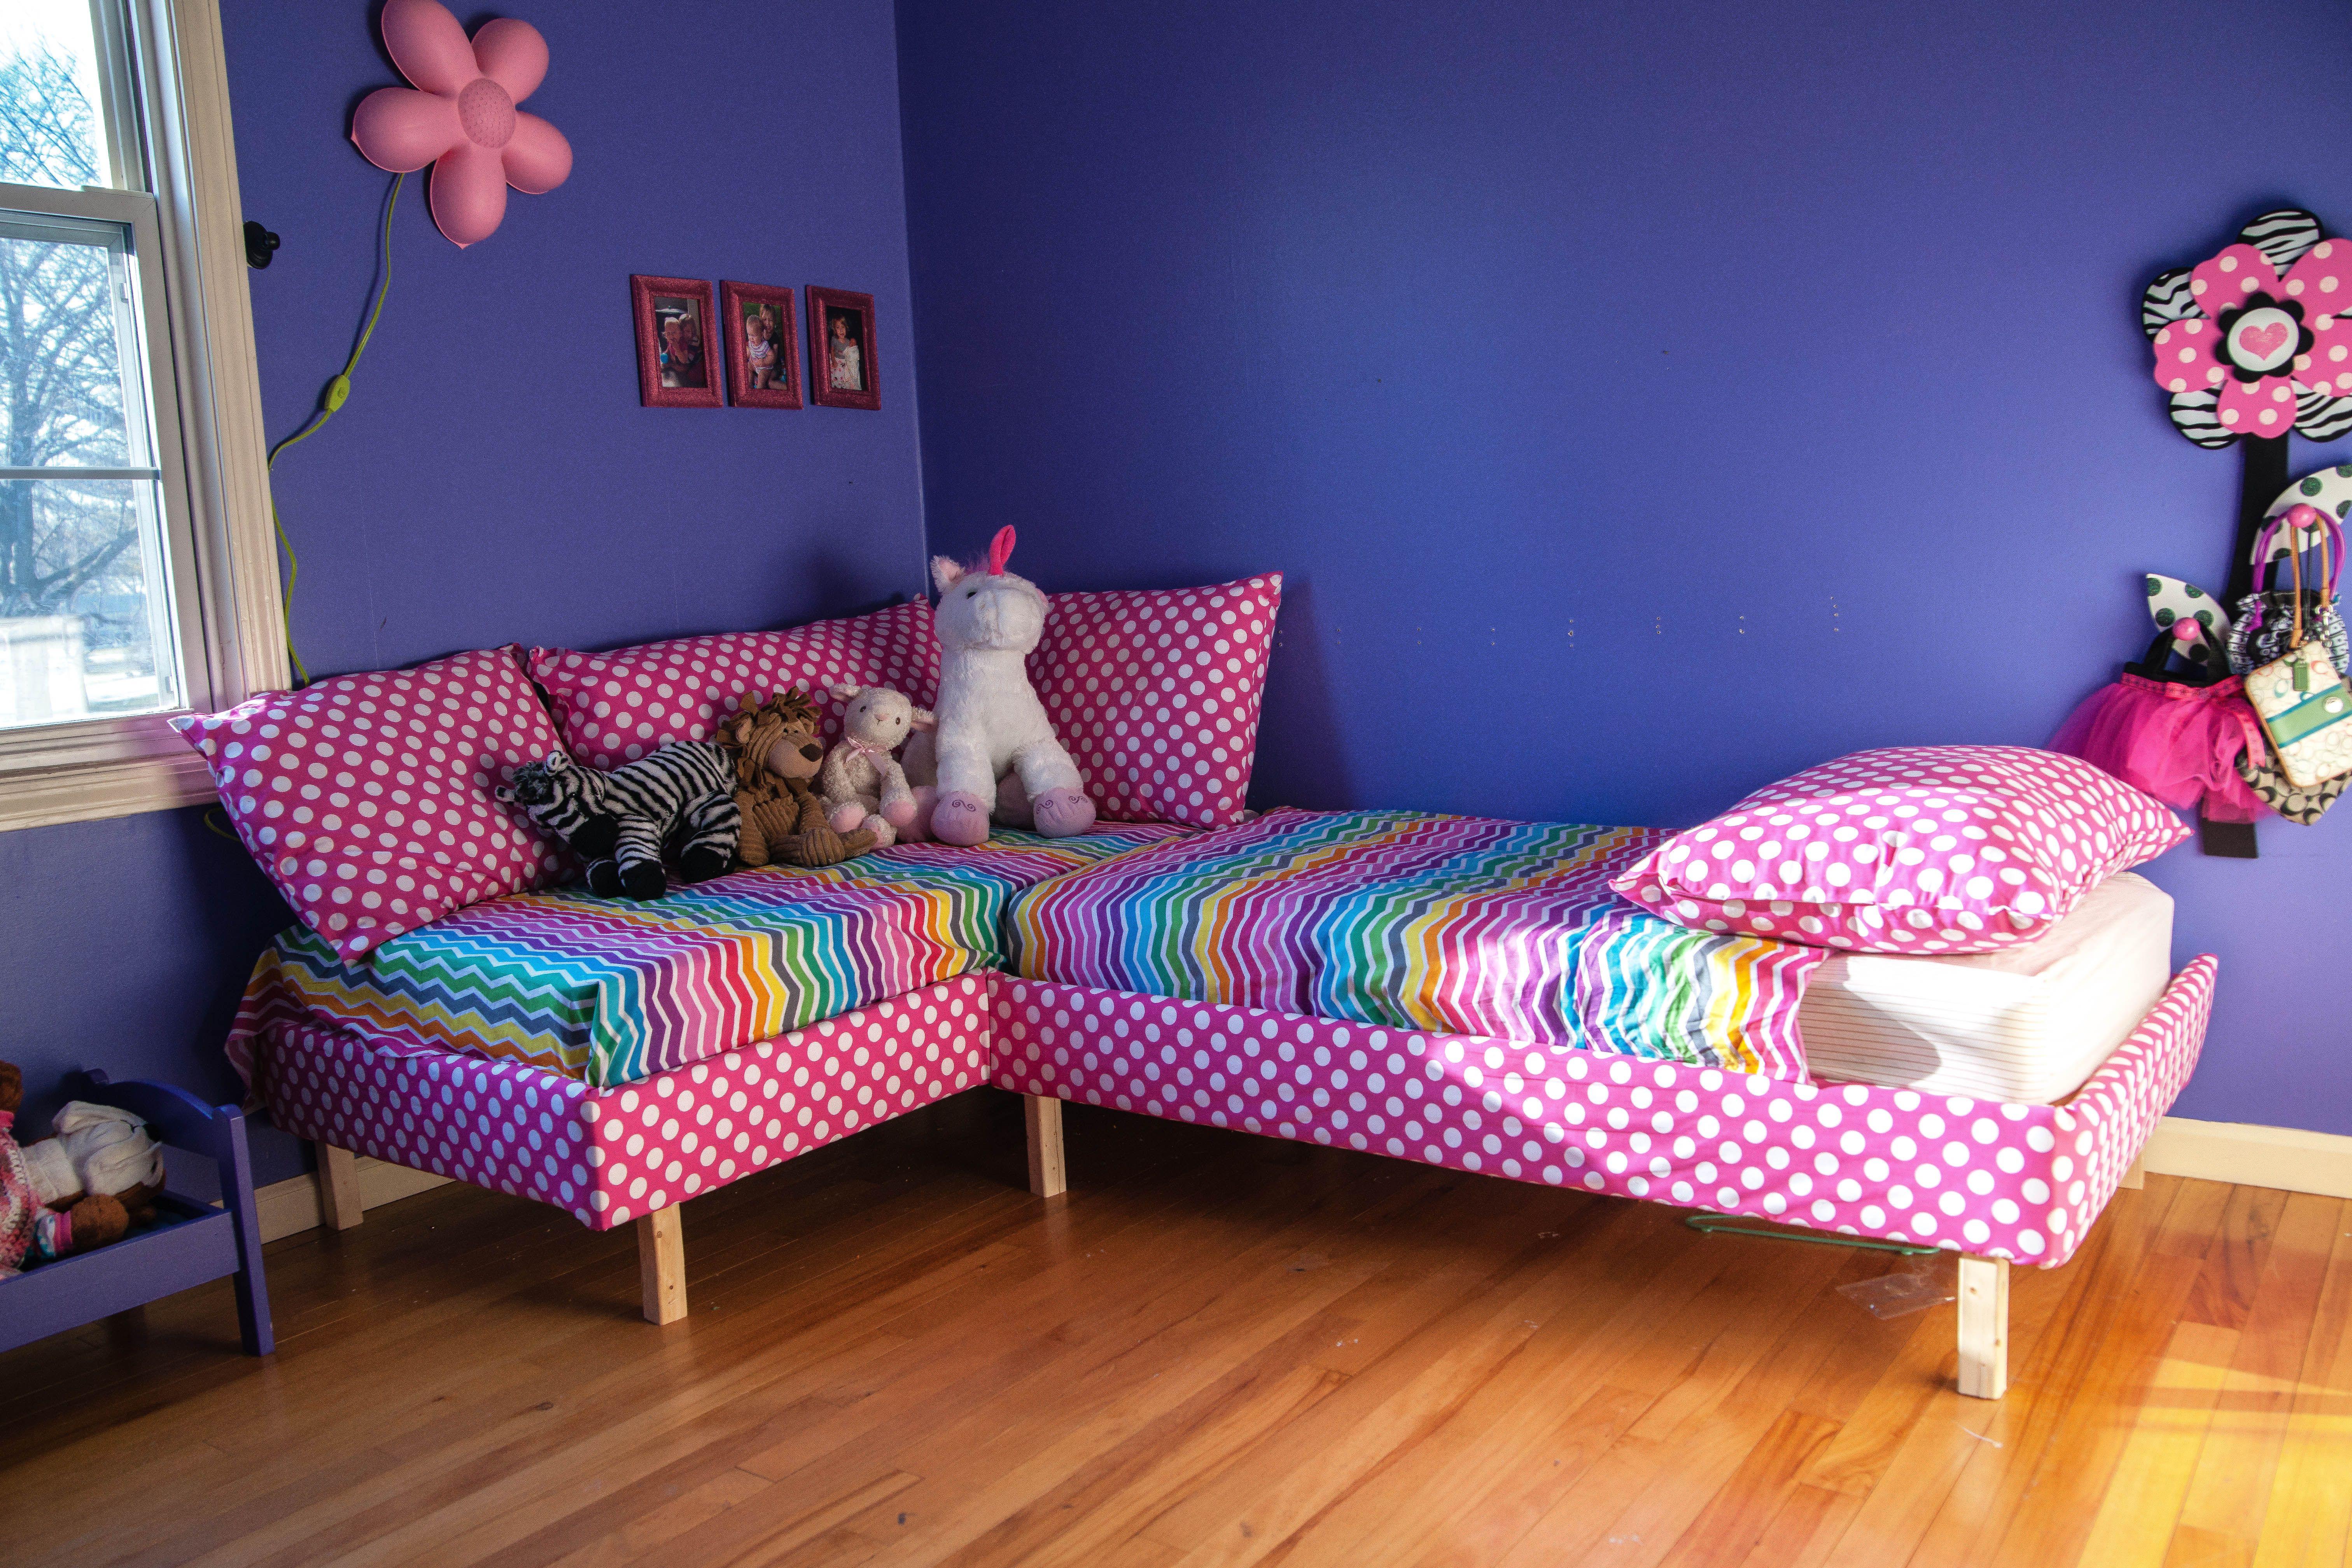 Sofa Bed For Child Leather Seat Repair Crib Mattress Kids Pinterest